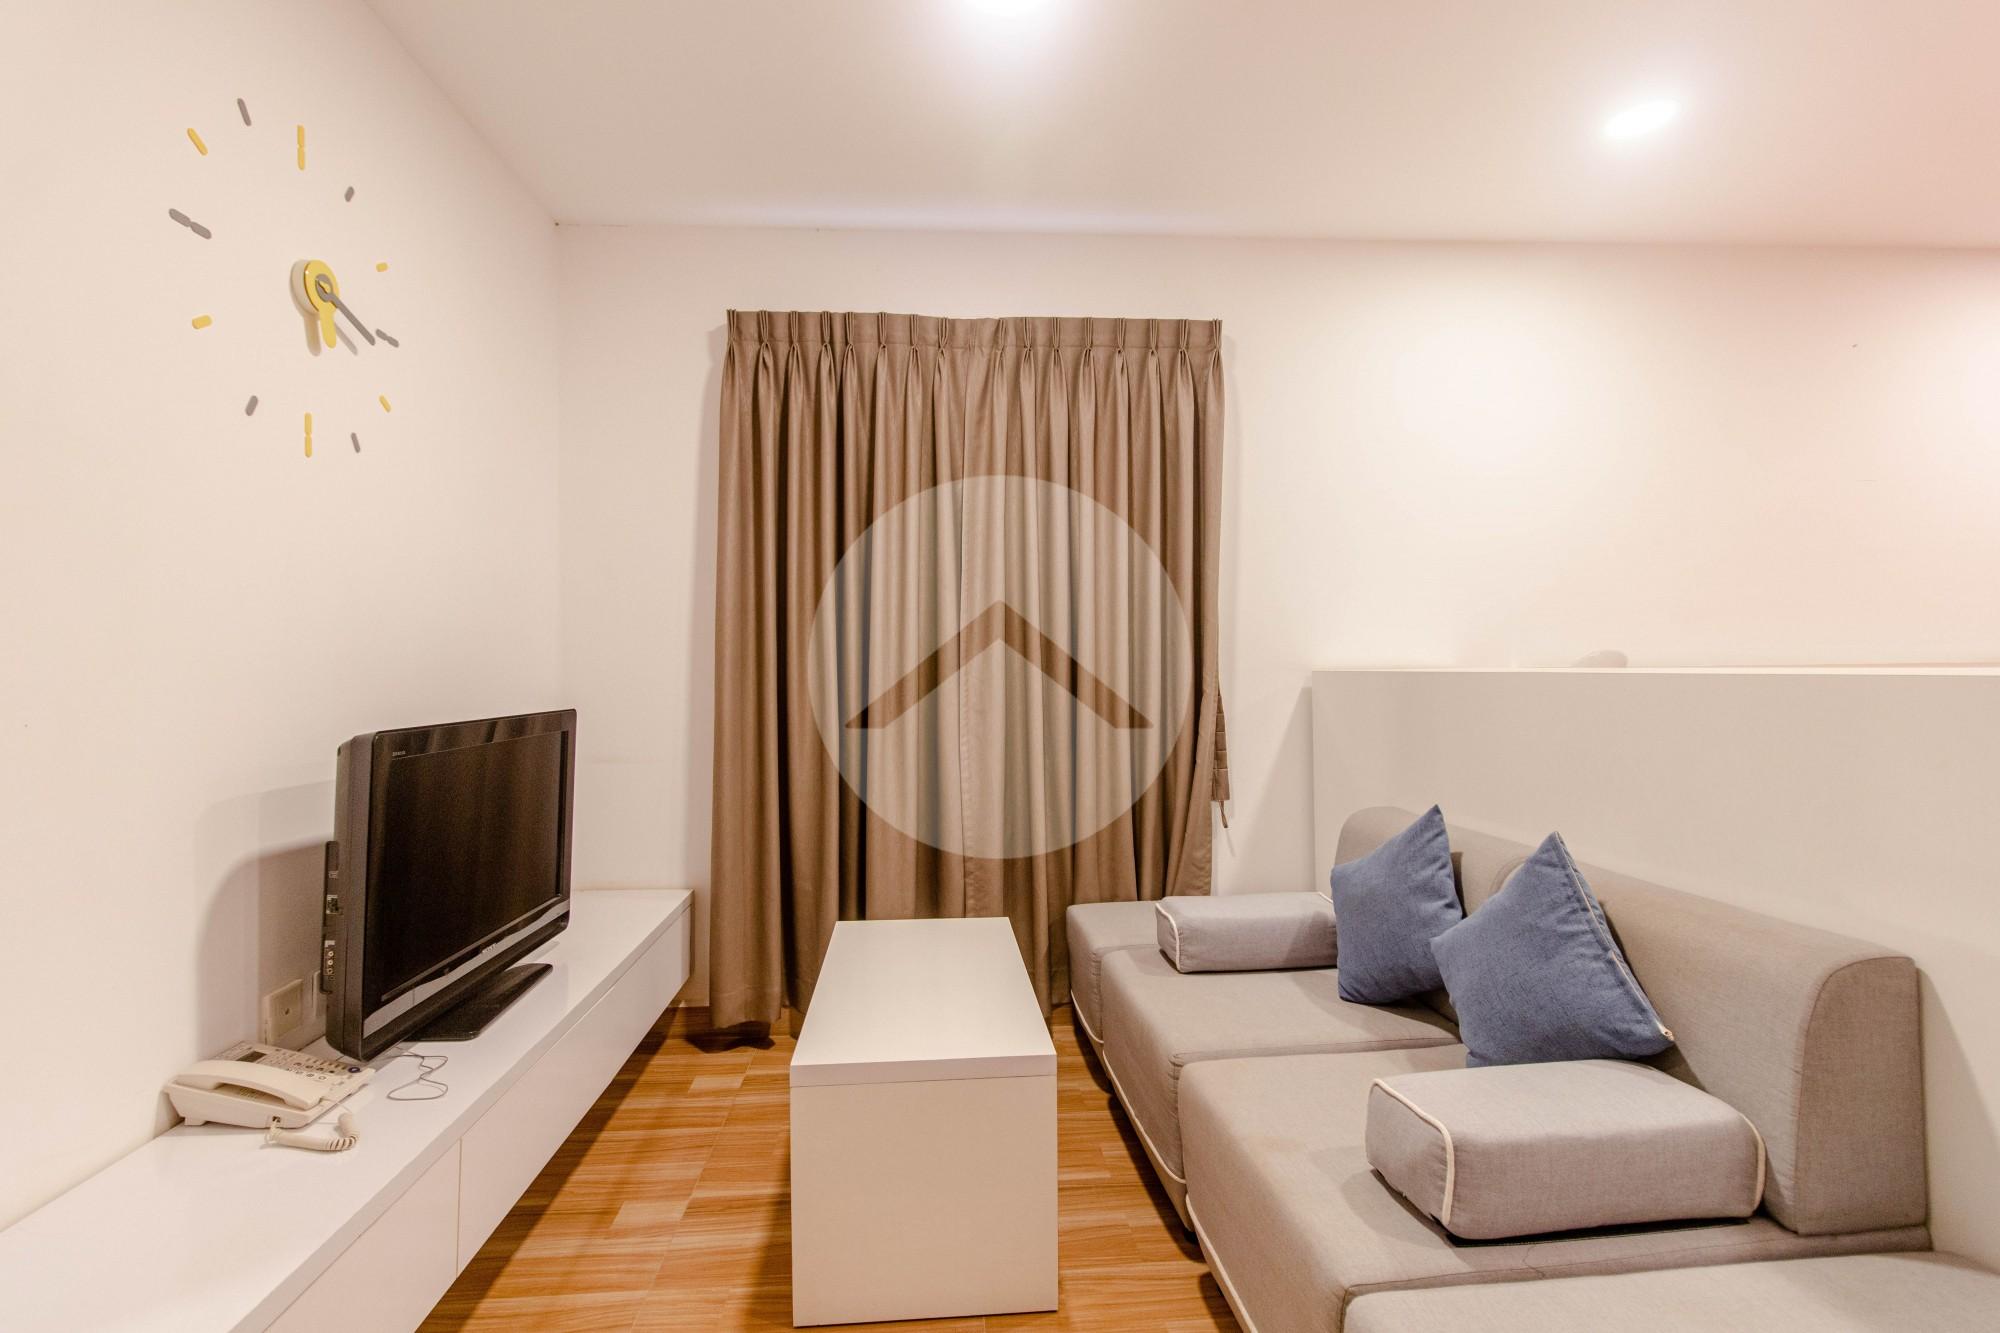 1 Bed Studio Condo For Sale - Svay Dangkum, Siem Reap